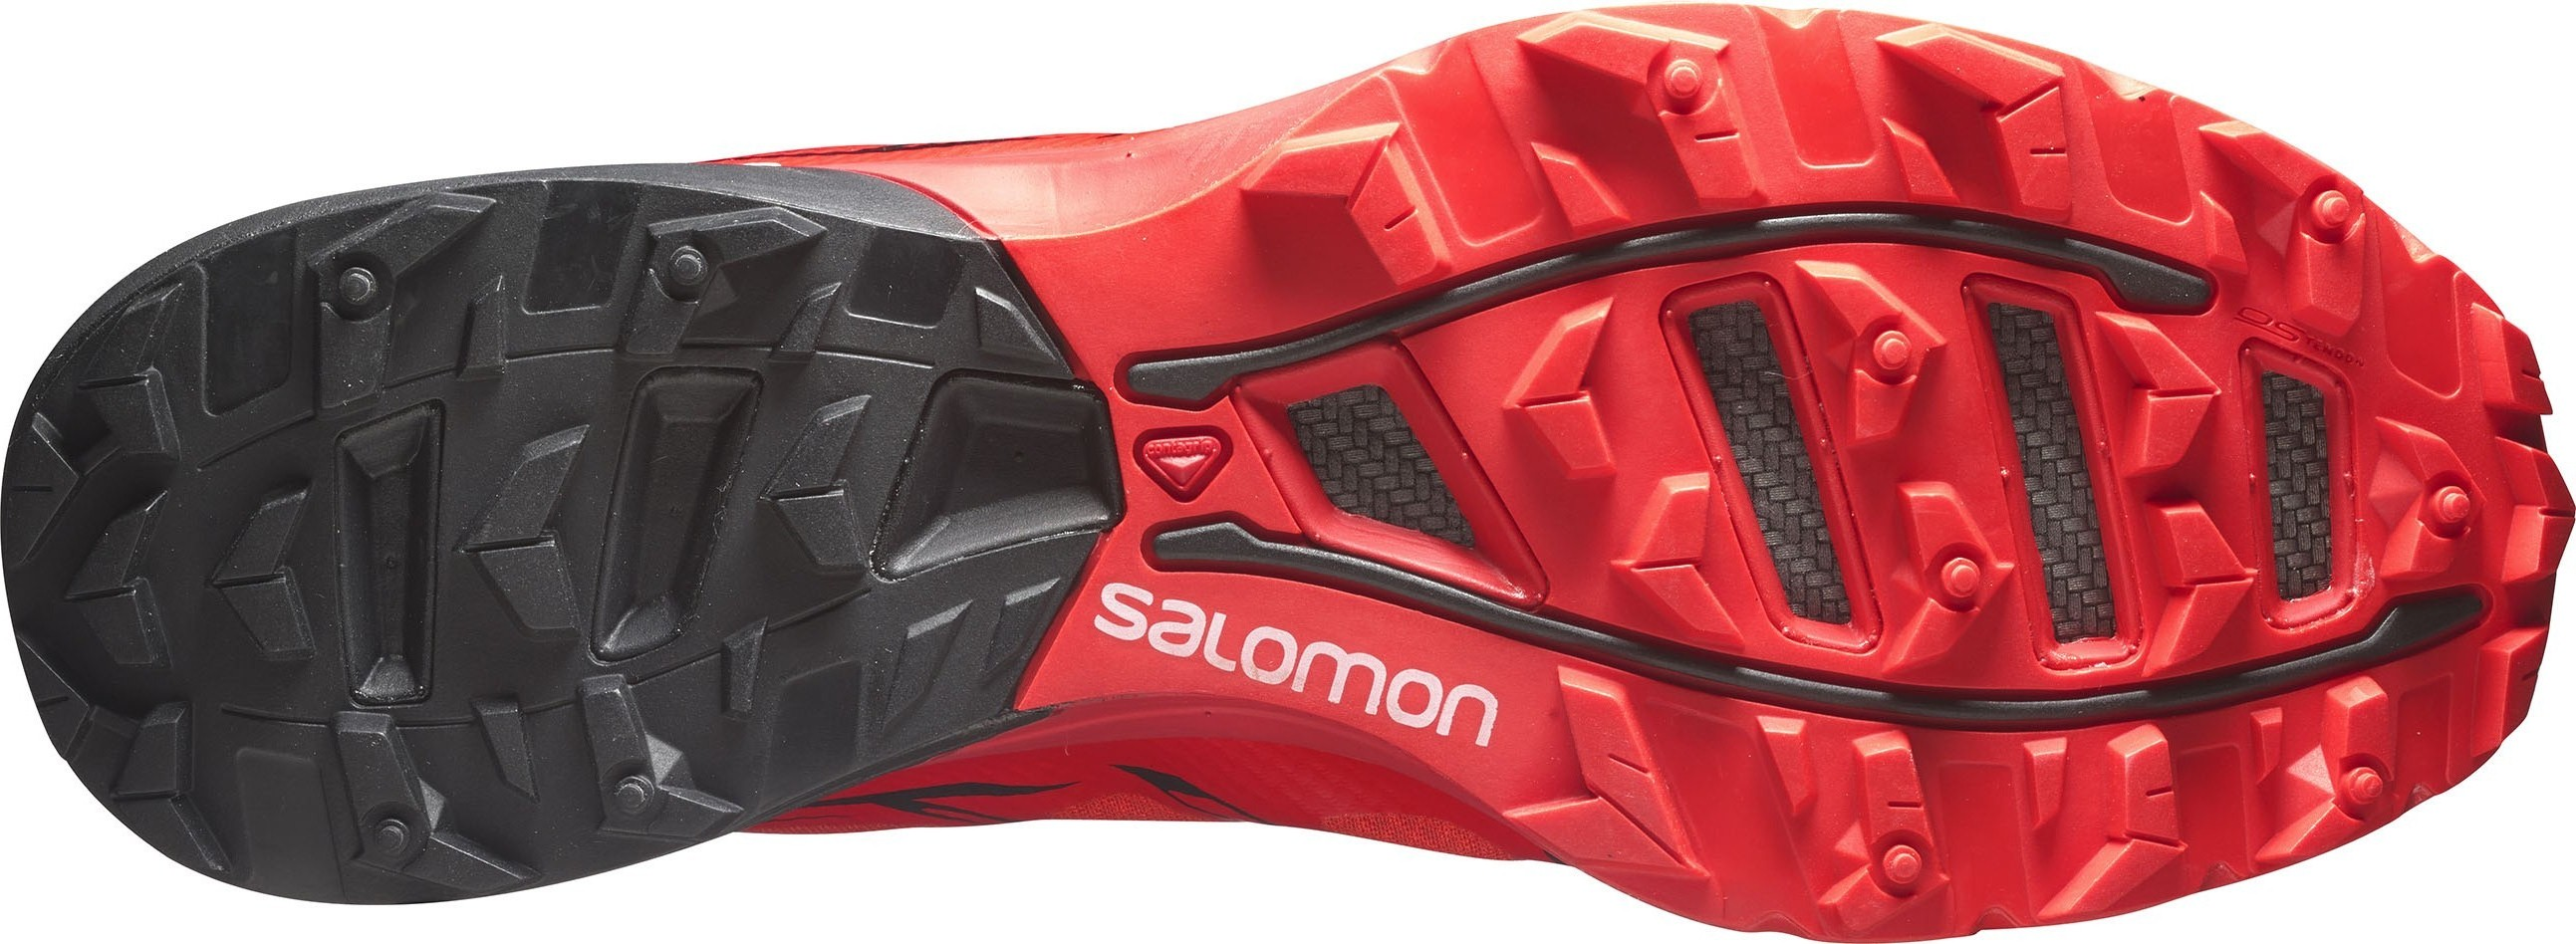 Salomon S-LAB SENSE Ultra SG Sula 8734b7fb18a75